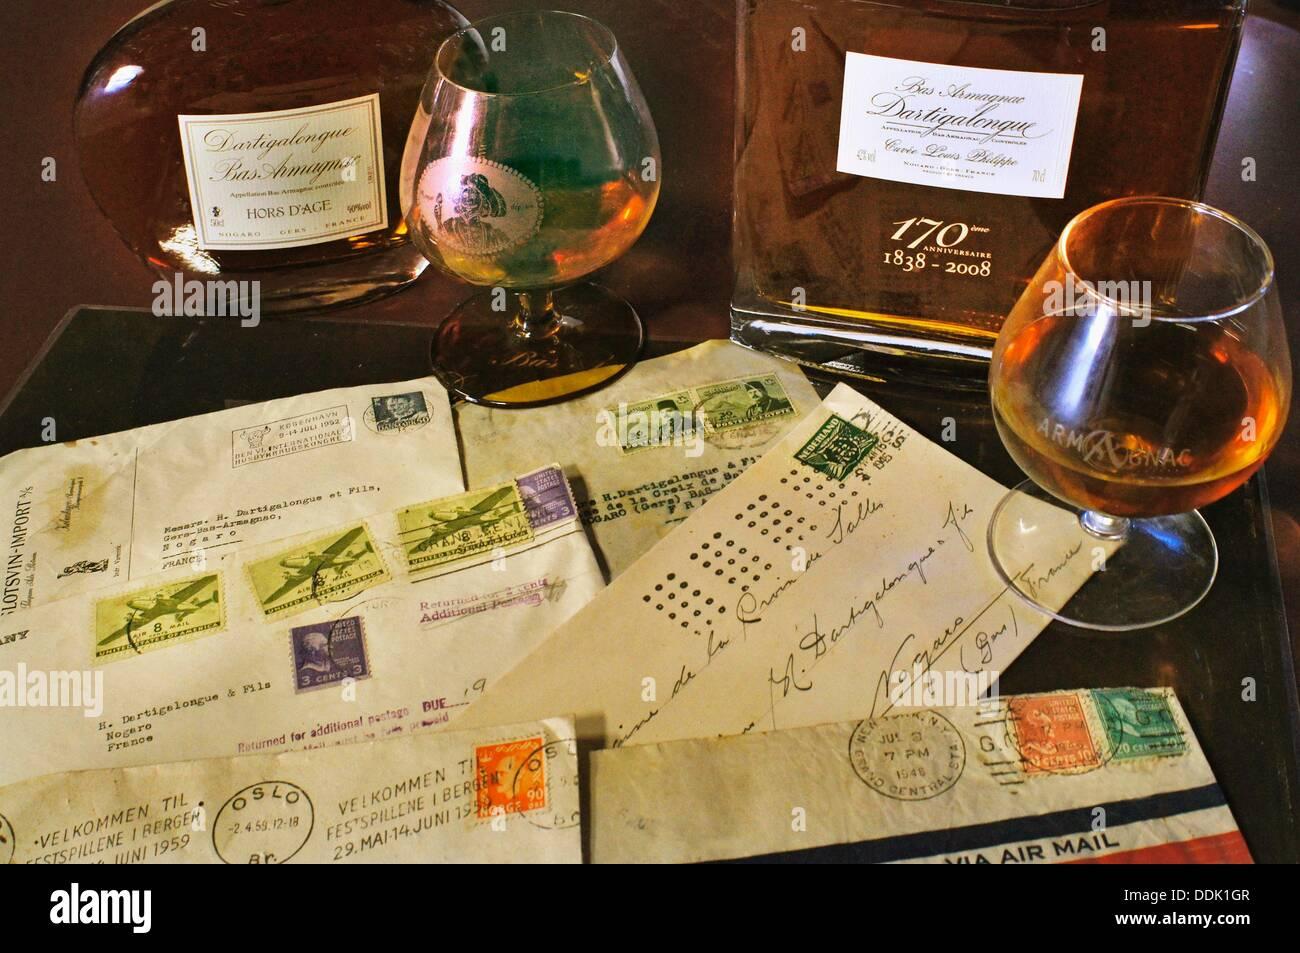 Exporting armagnac to many countries, Armagnac Dartigalongue estate at Nogaro, Gers, Midi-Pyrenees, France - Stock Image